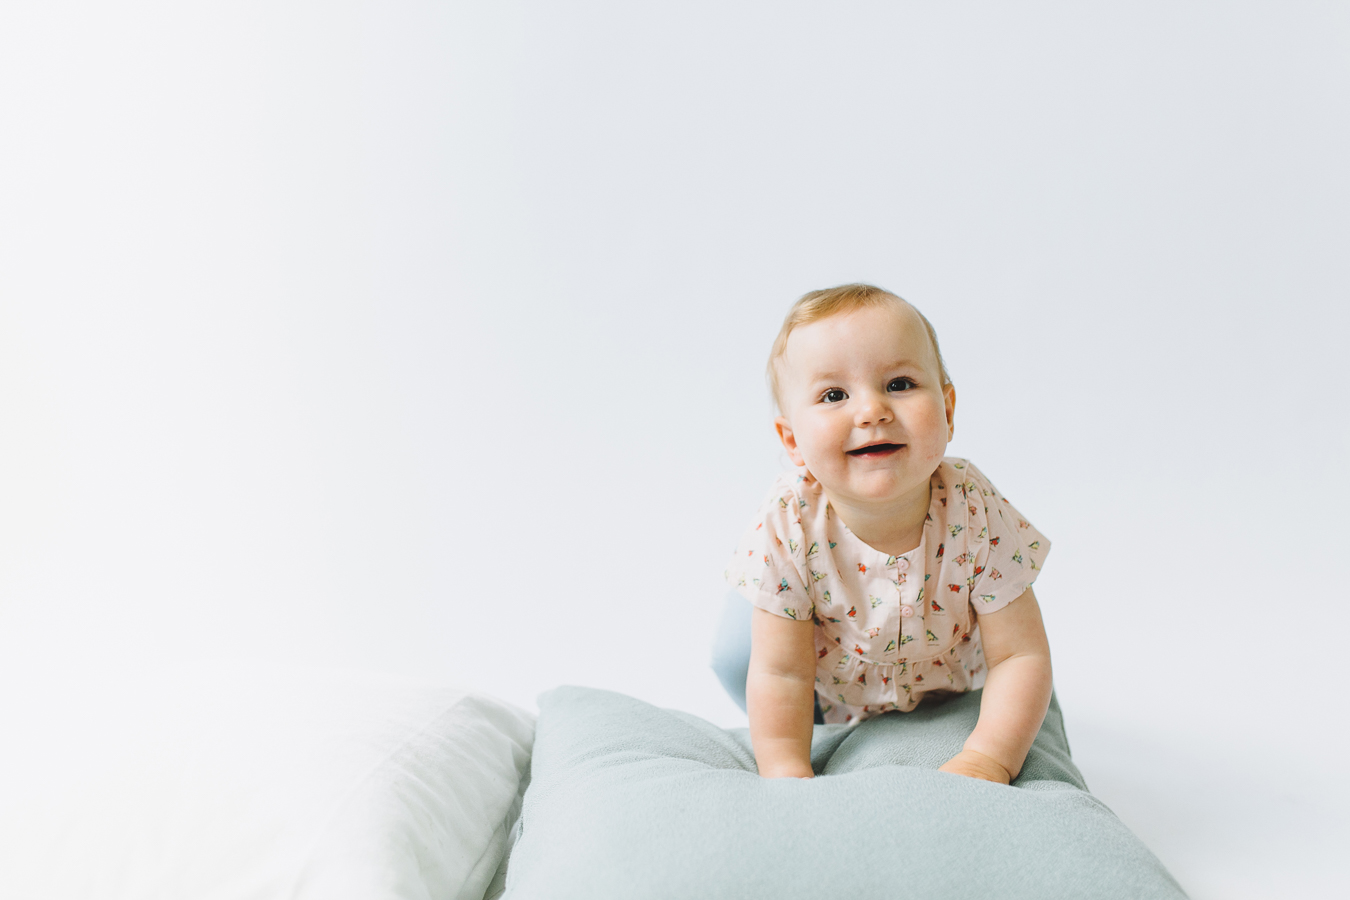 Baby-Lifestyle-Photographer-Portrait-15.jpg